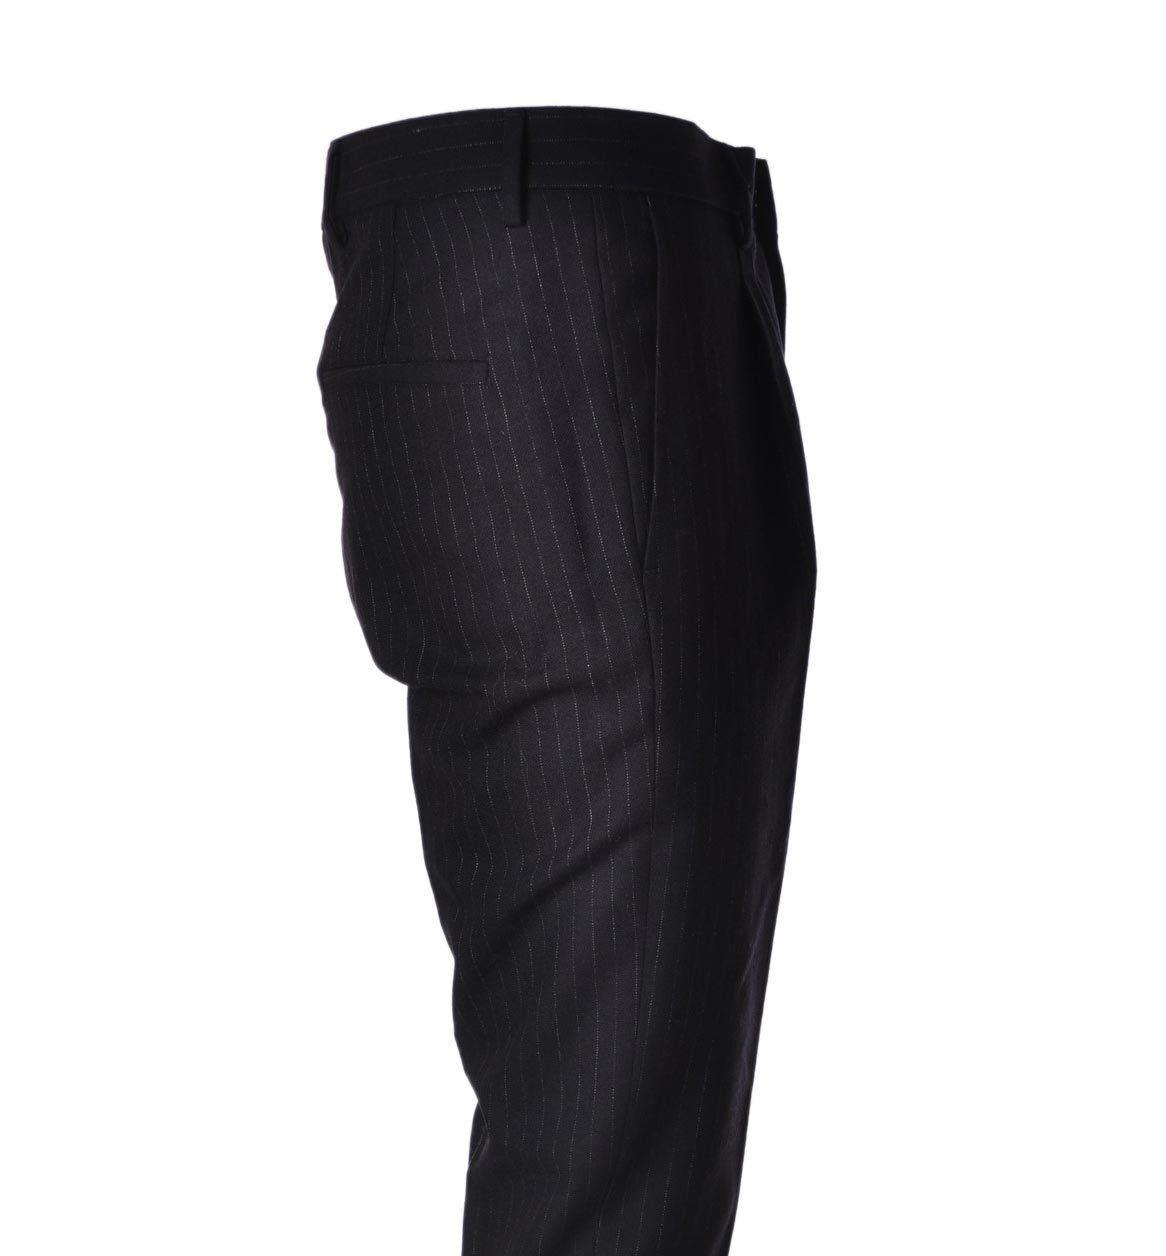 Low Brand - Pants-Pants - Man - bluee - 4310710C184311